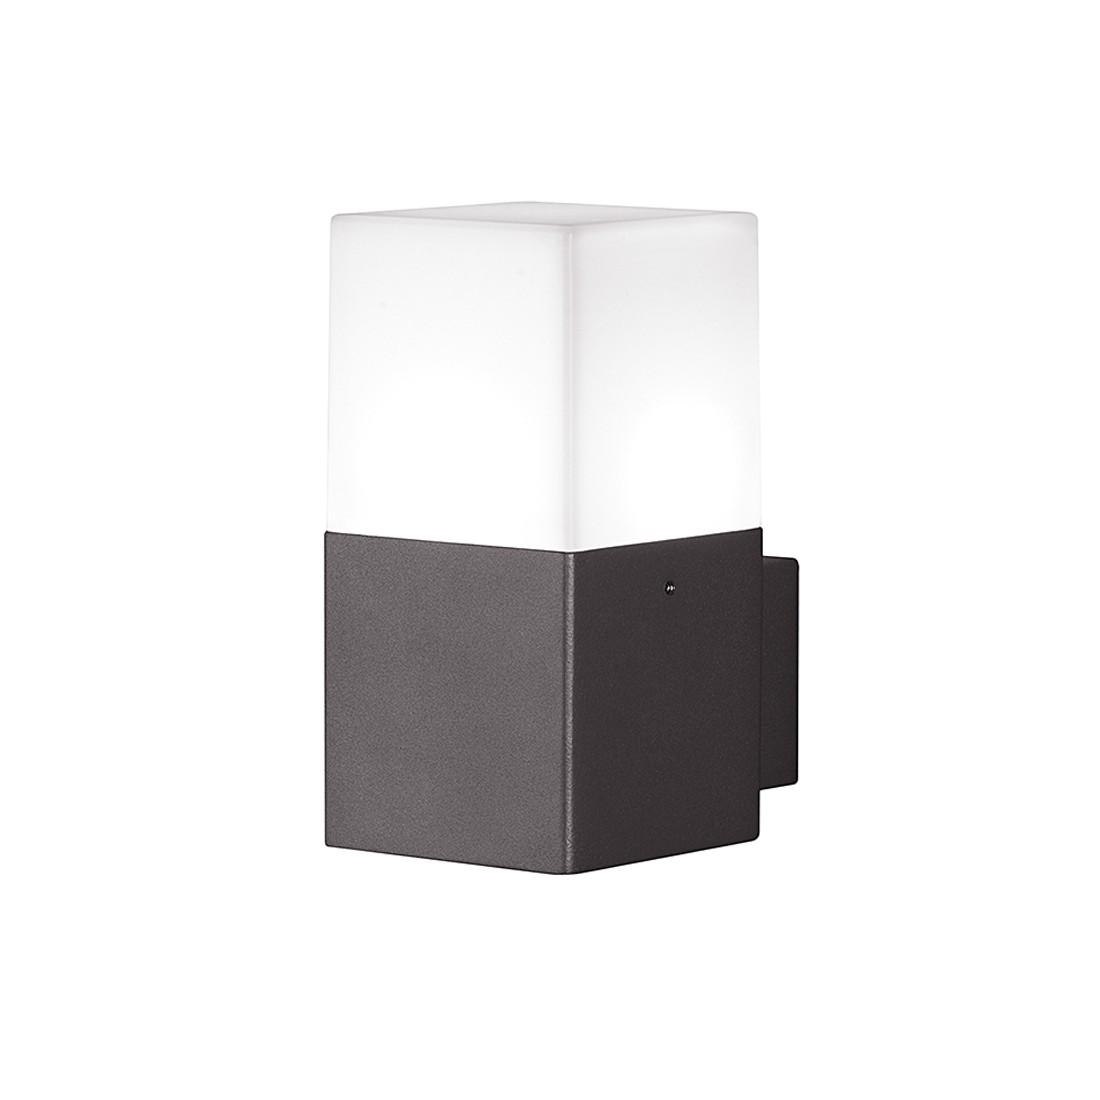 EEK A++, LED-Außenleuchte Hudson - Aluminium / Kunststoff - Anthrazit - 1-flammig, Trio